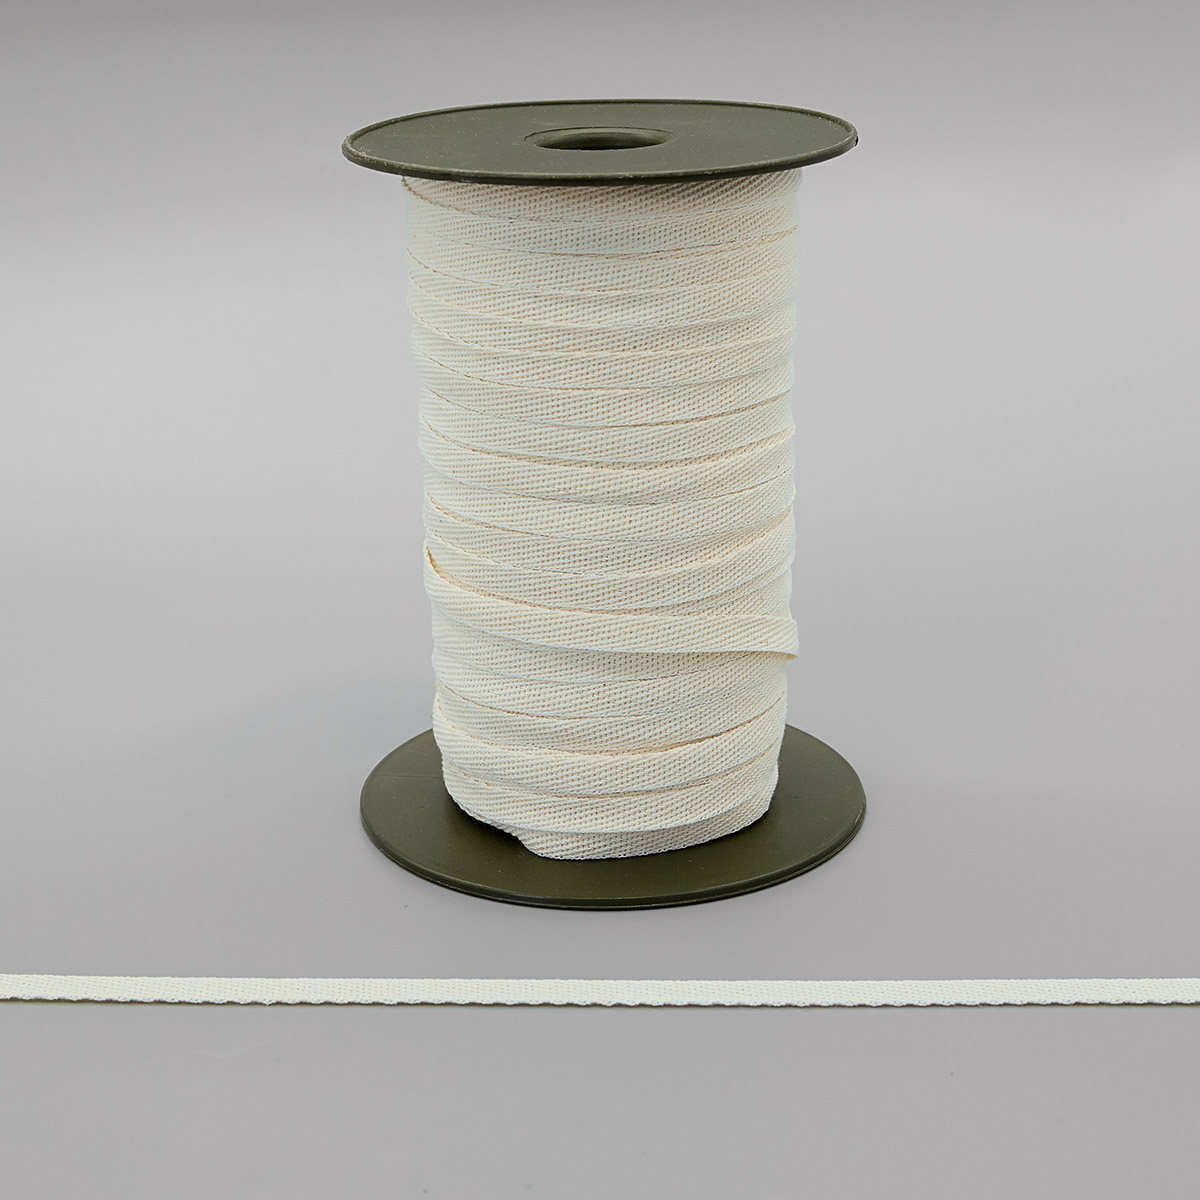 1008Б Лента киперная, белый (суровый), 8 мм*100 м